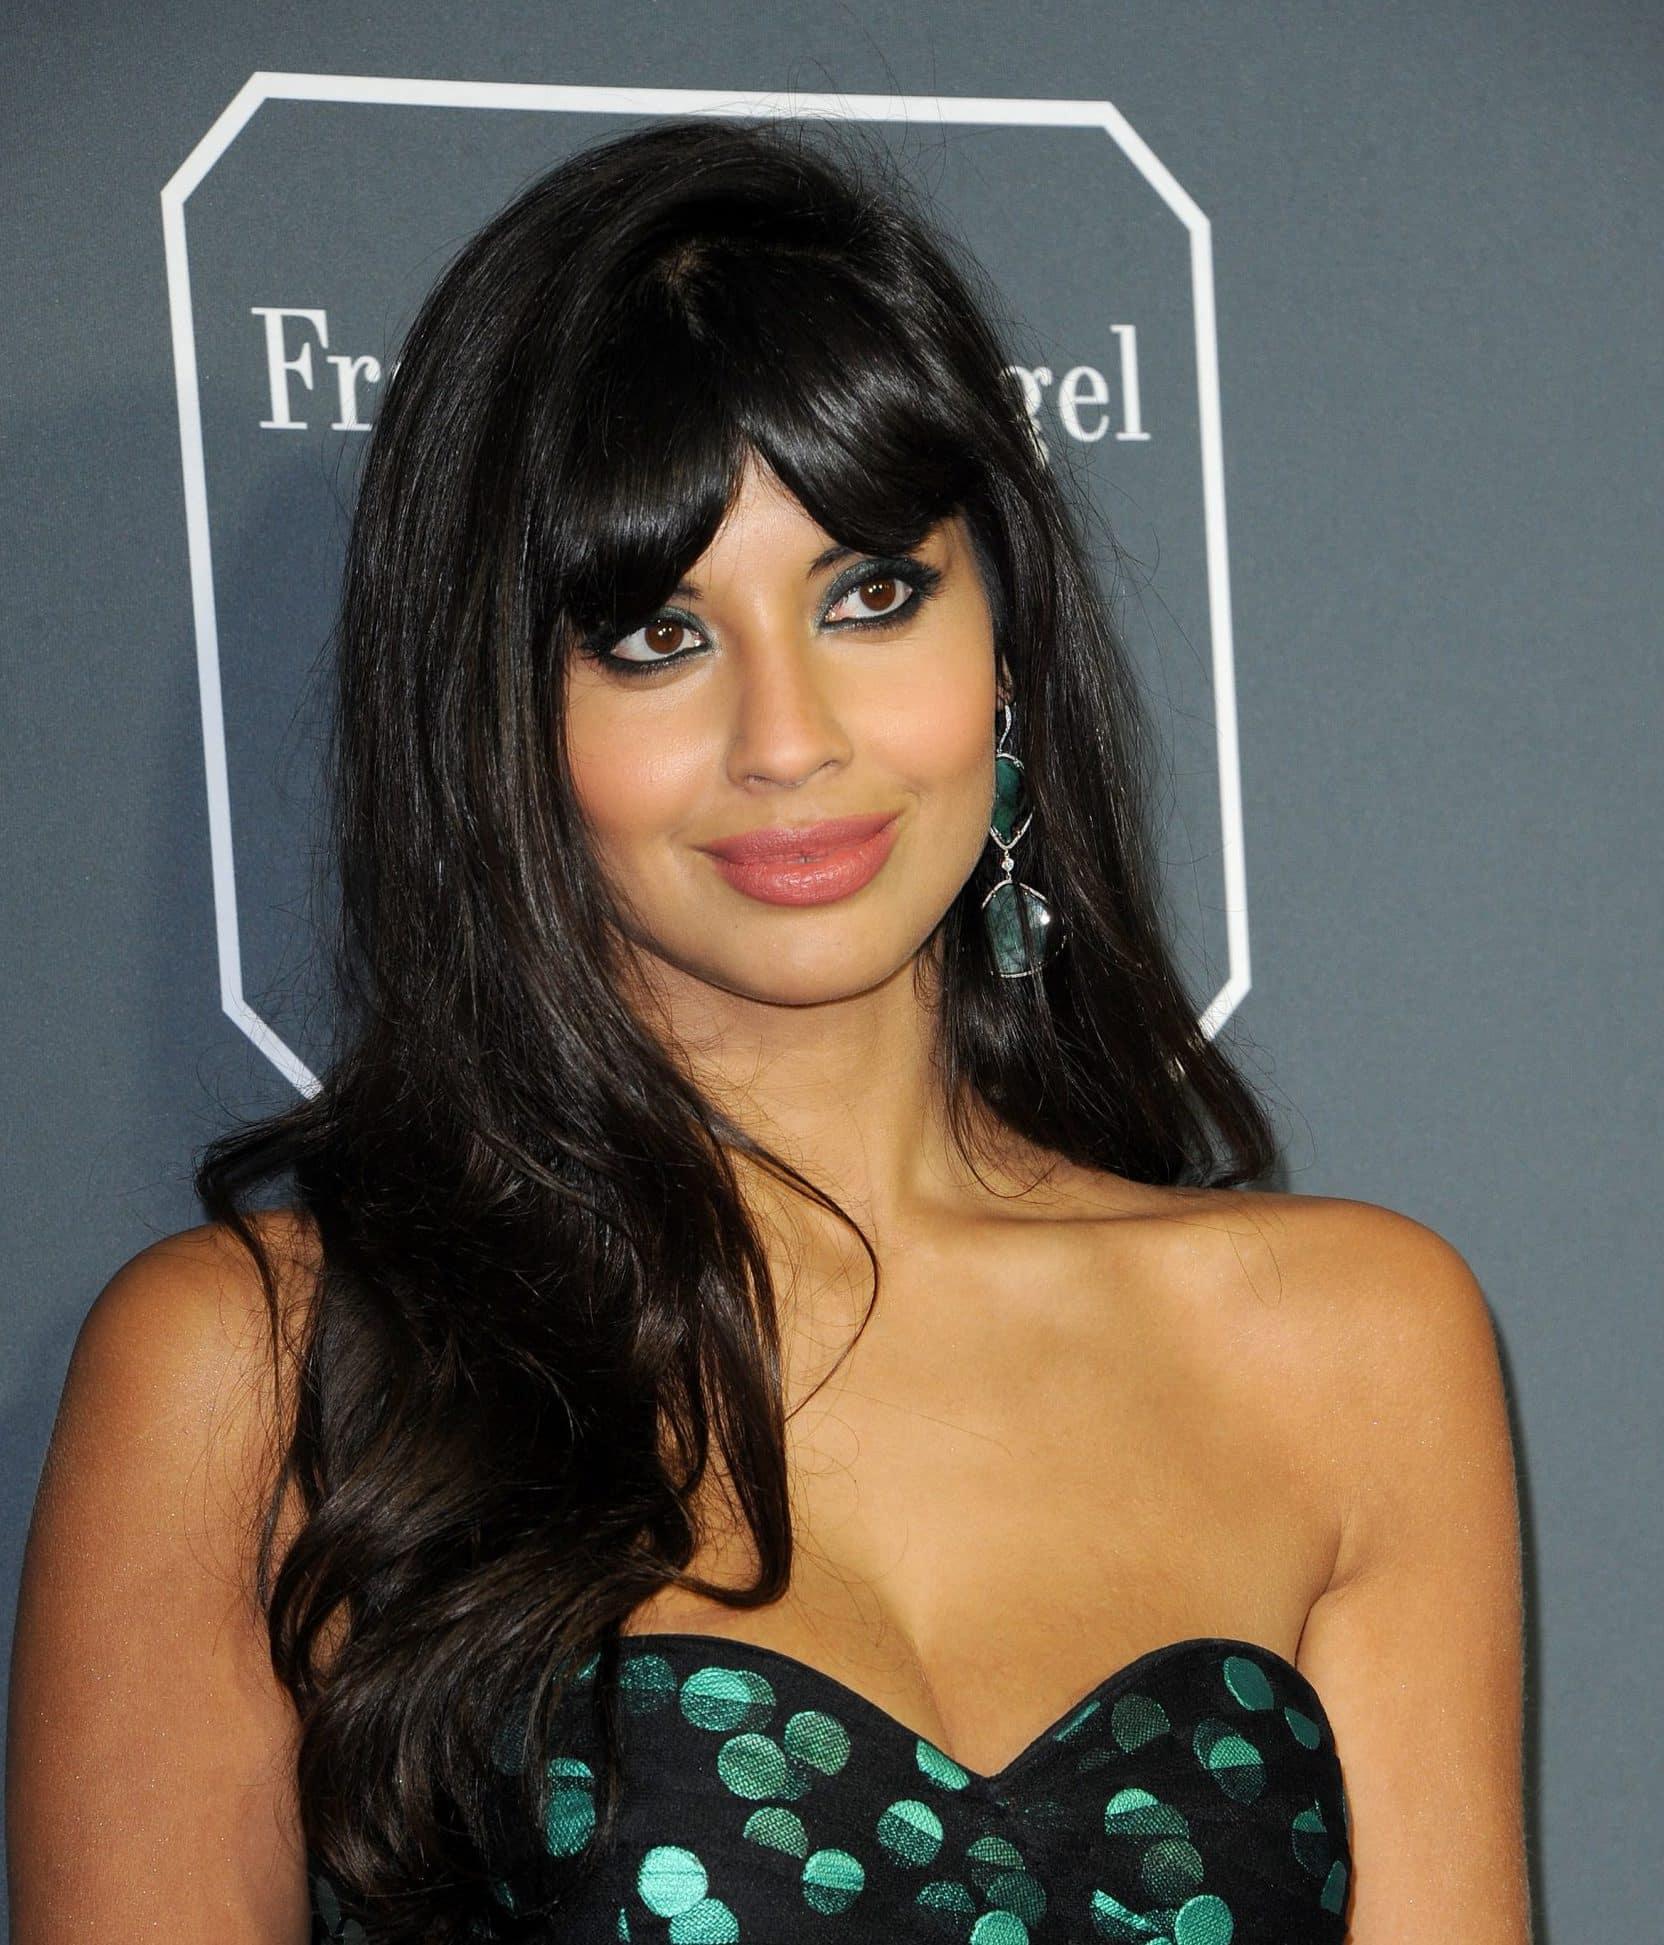 Jameela Jamil (Photo: TInseltown/Shutterstock.com)